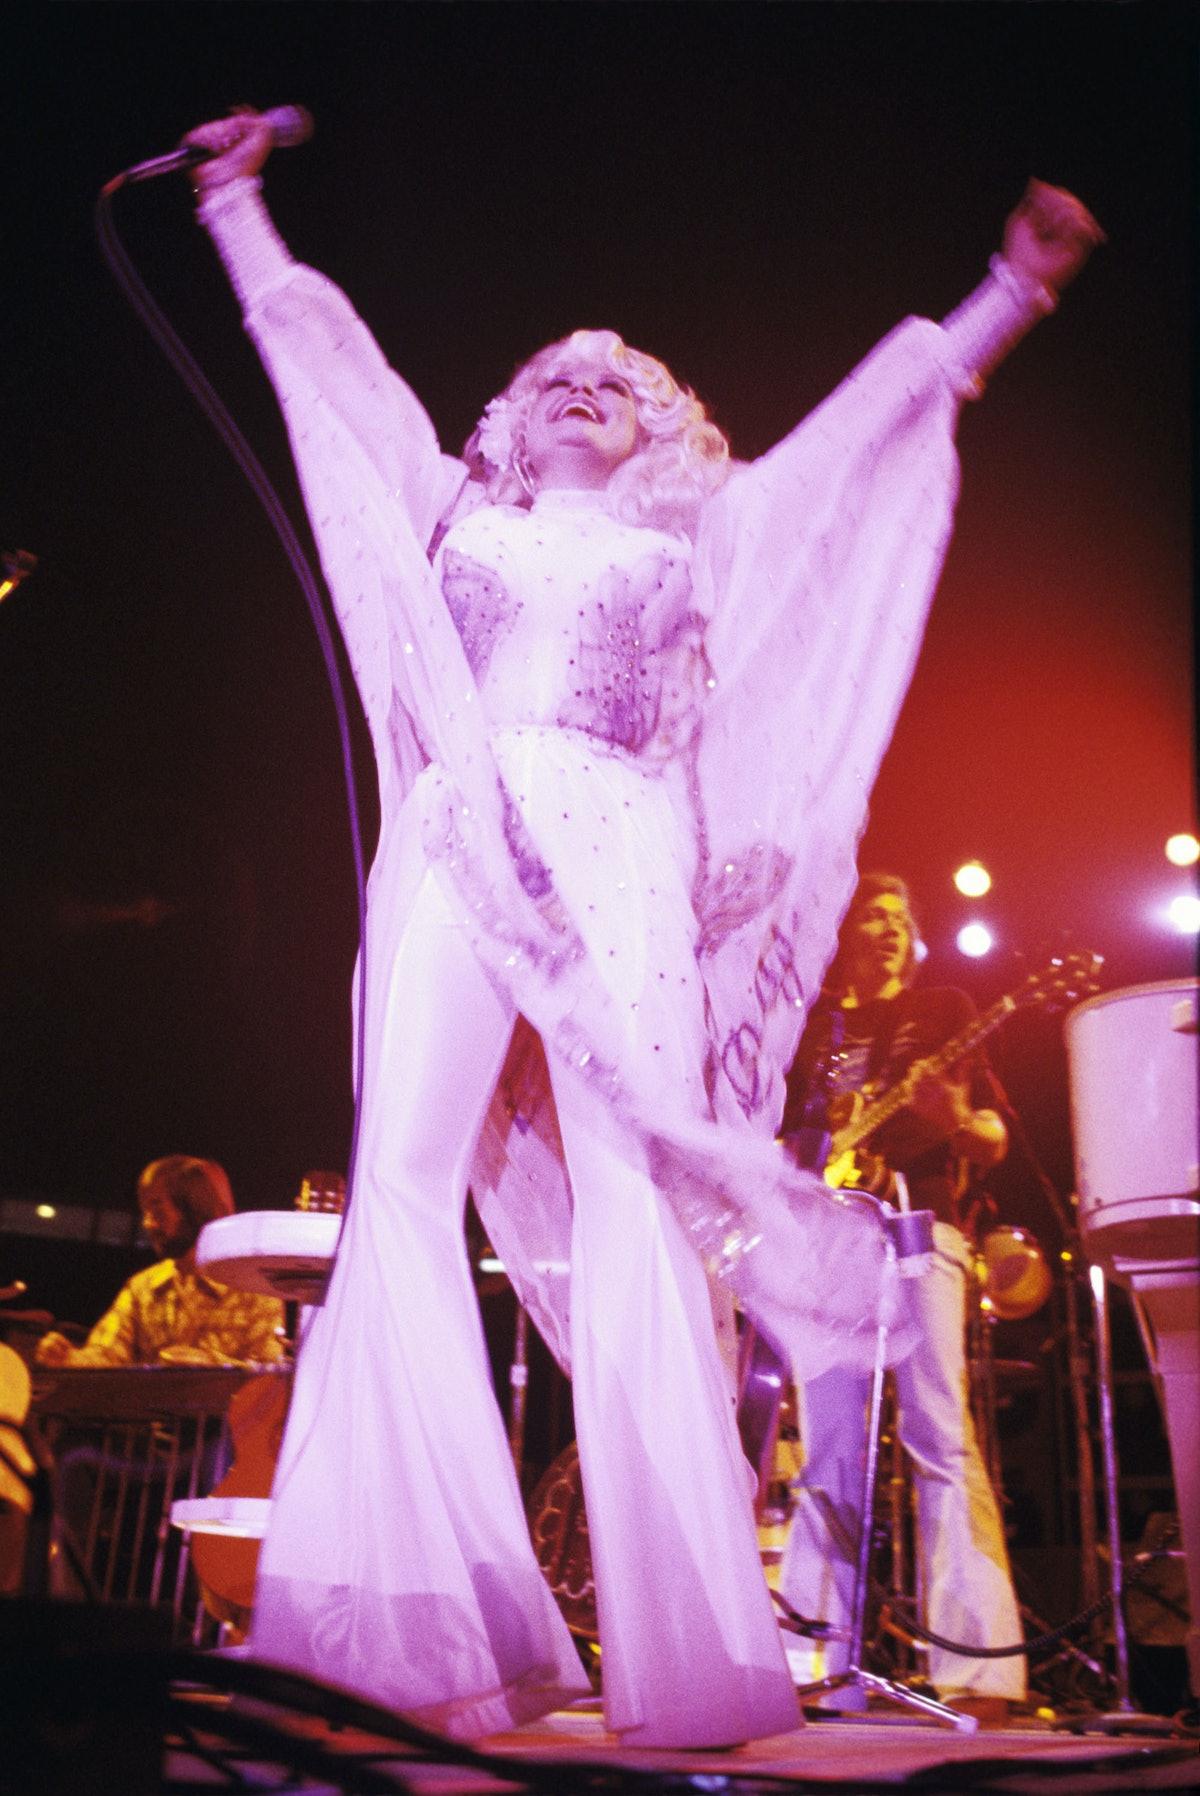 Dolly Parton Performs at Tech Coliseum - October 22, 1977